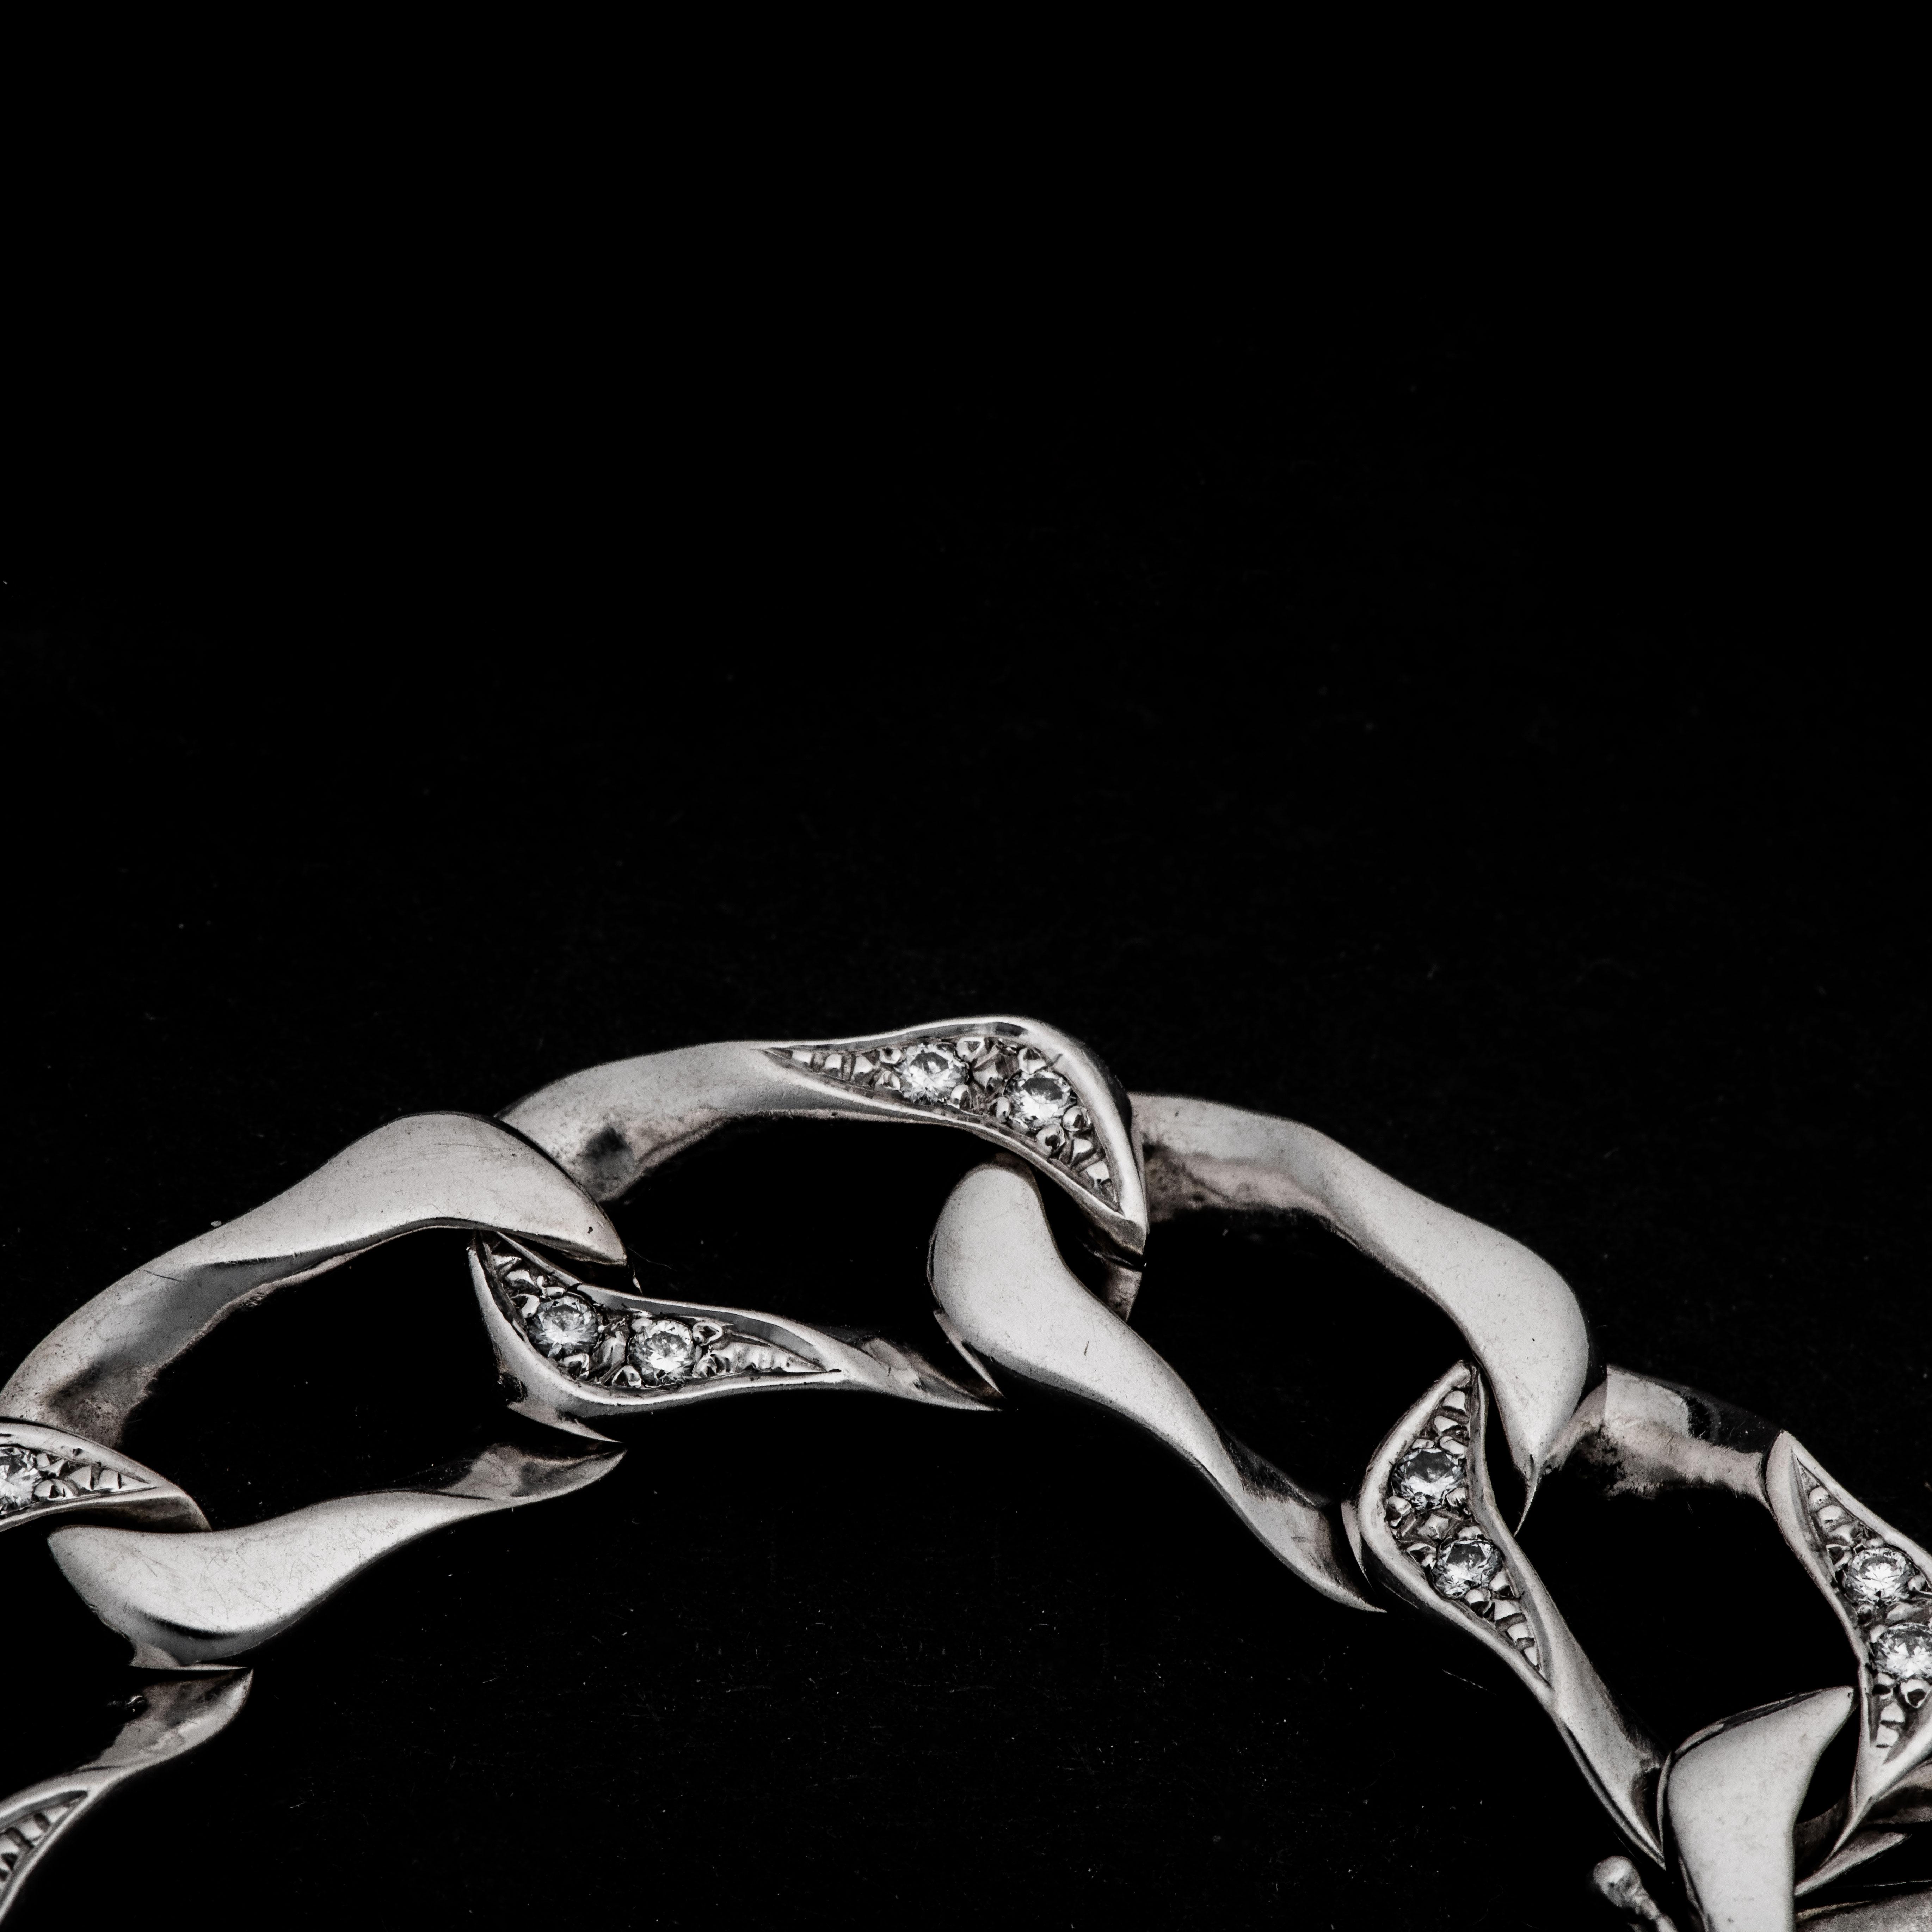 Avlangt Panser armbånd, hvitt gull, diamanter